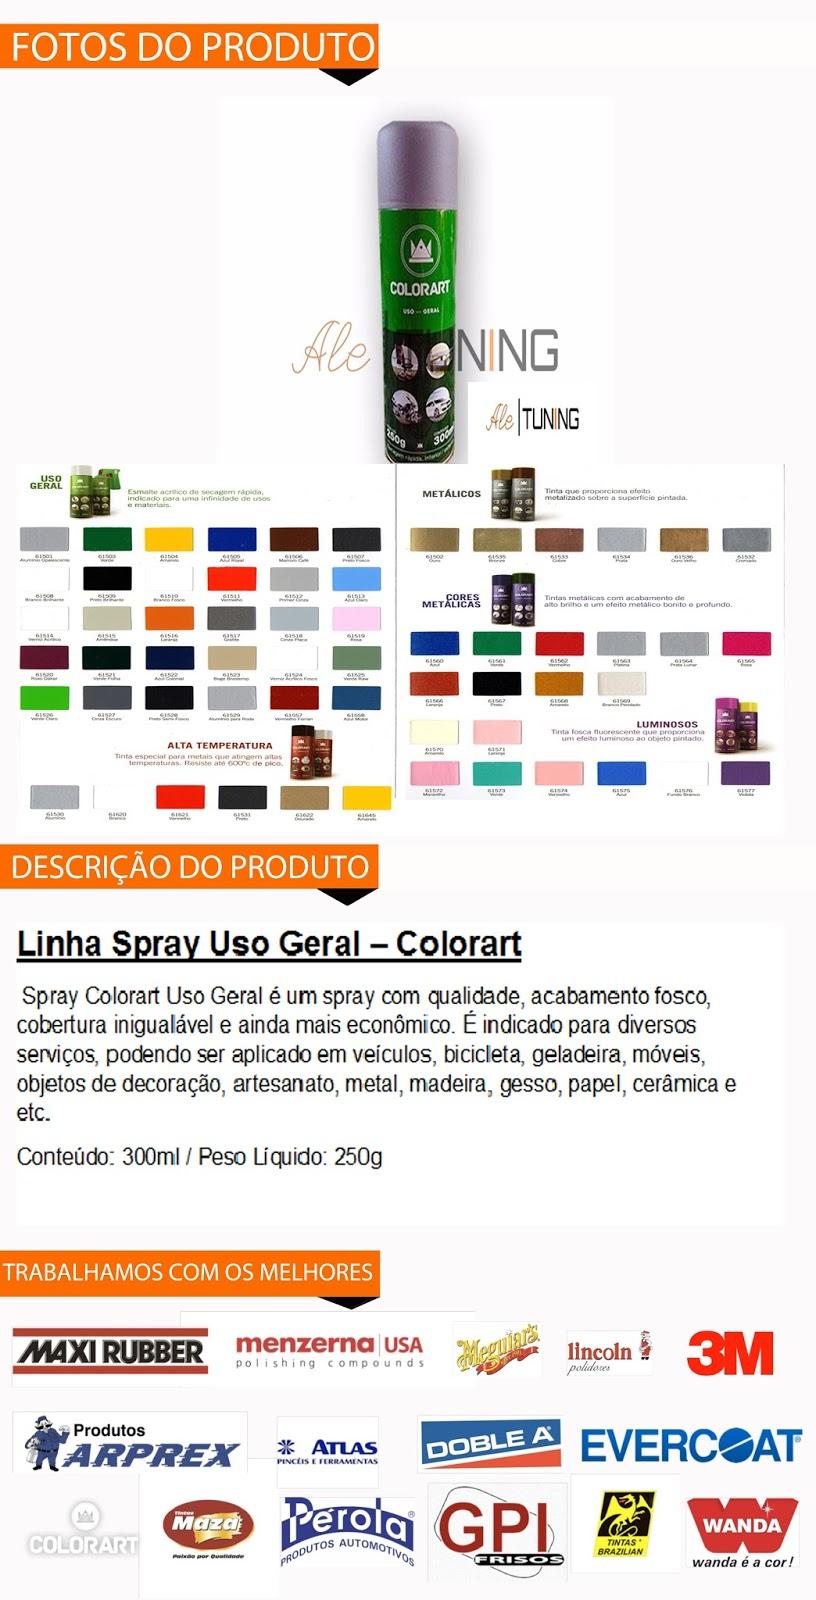 Tinta Spray Automotivo Primer Cinza - Colorart Uso Geral em Diadema